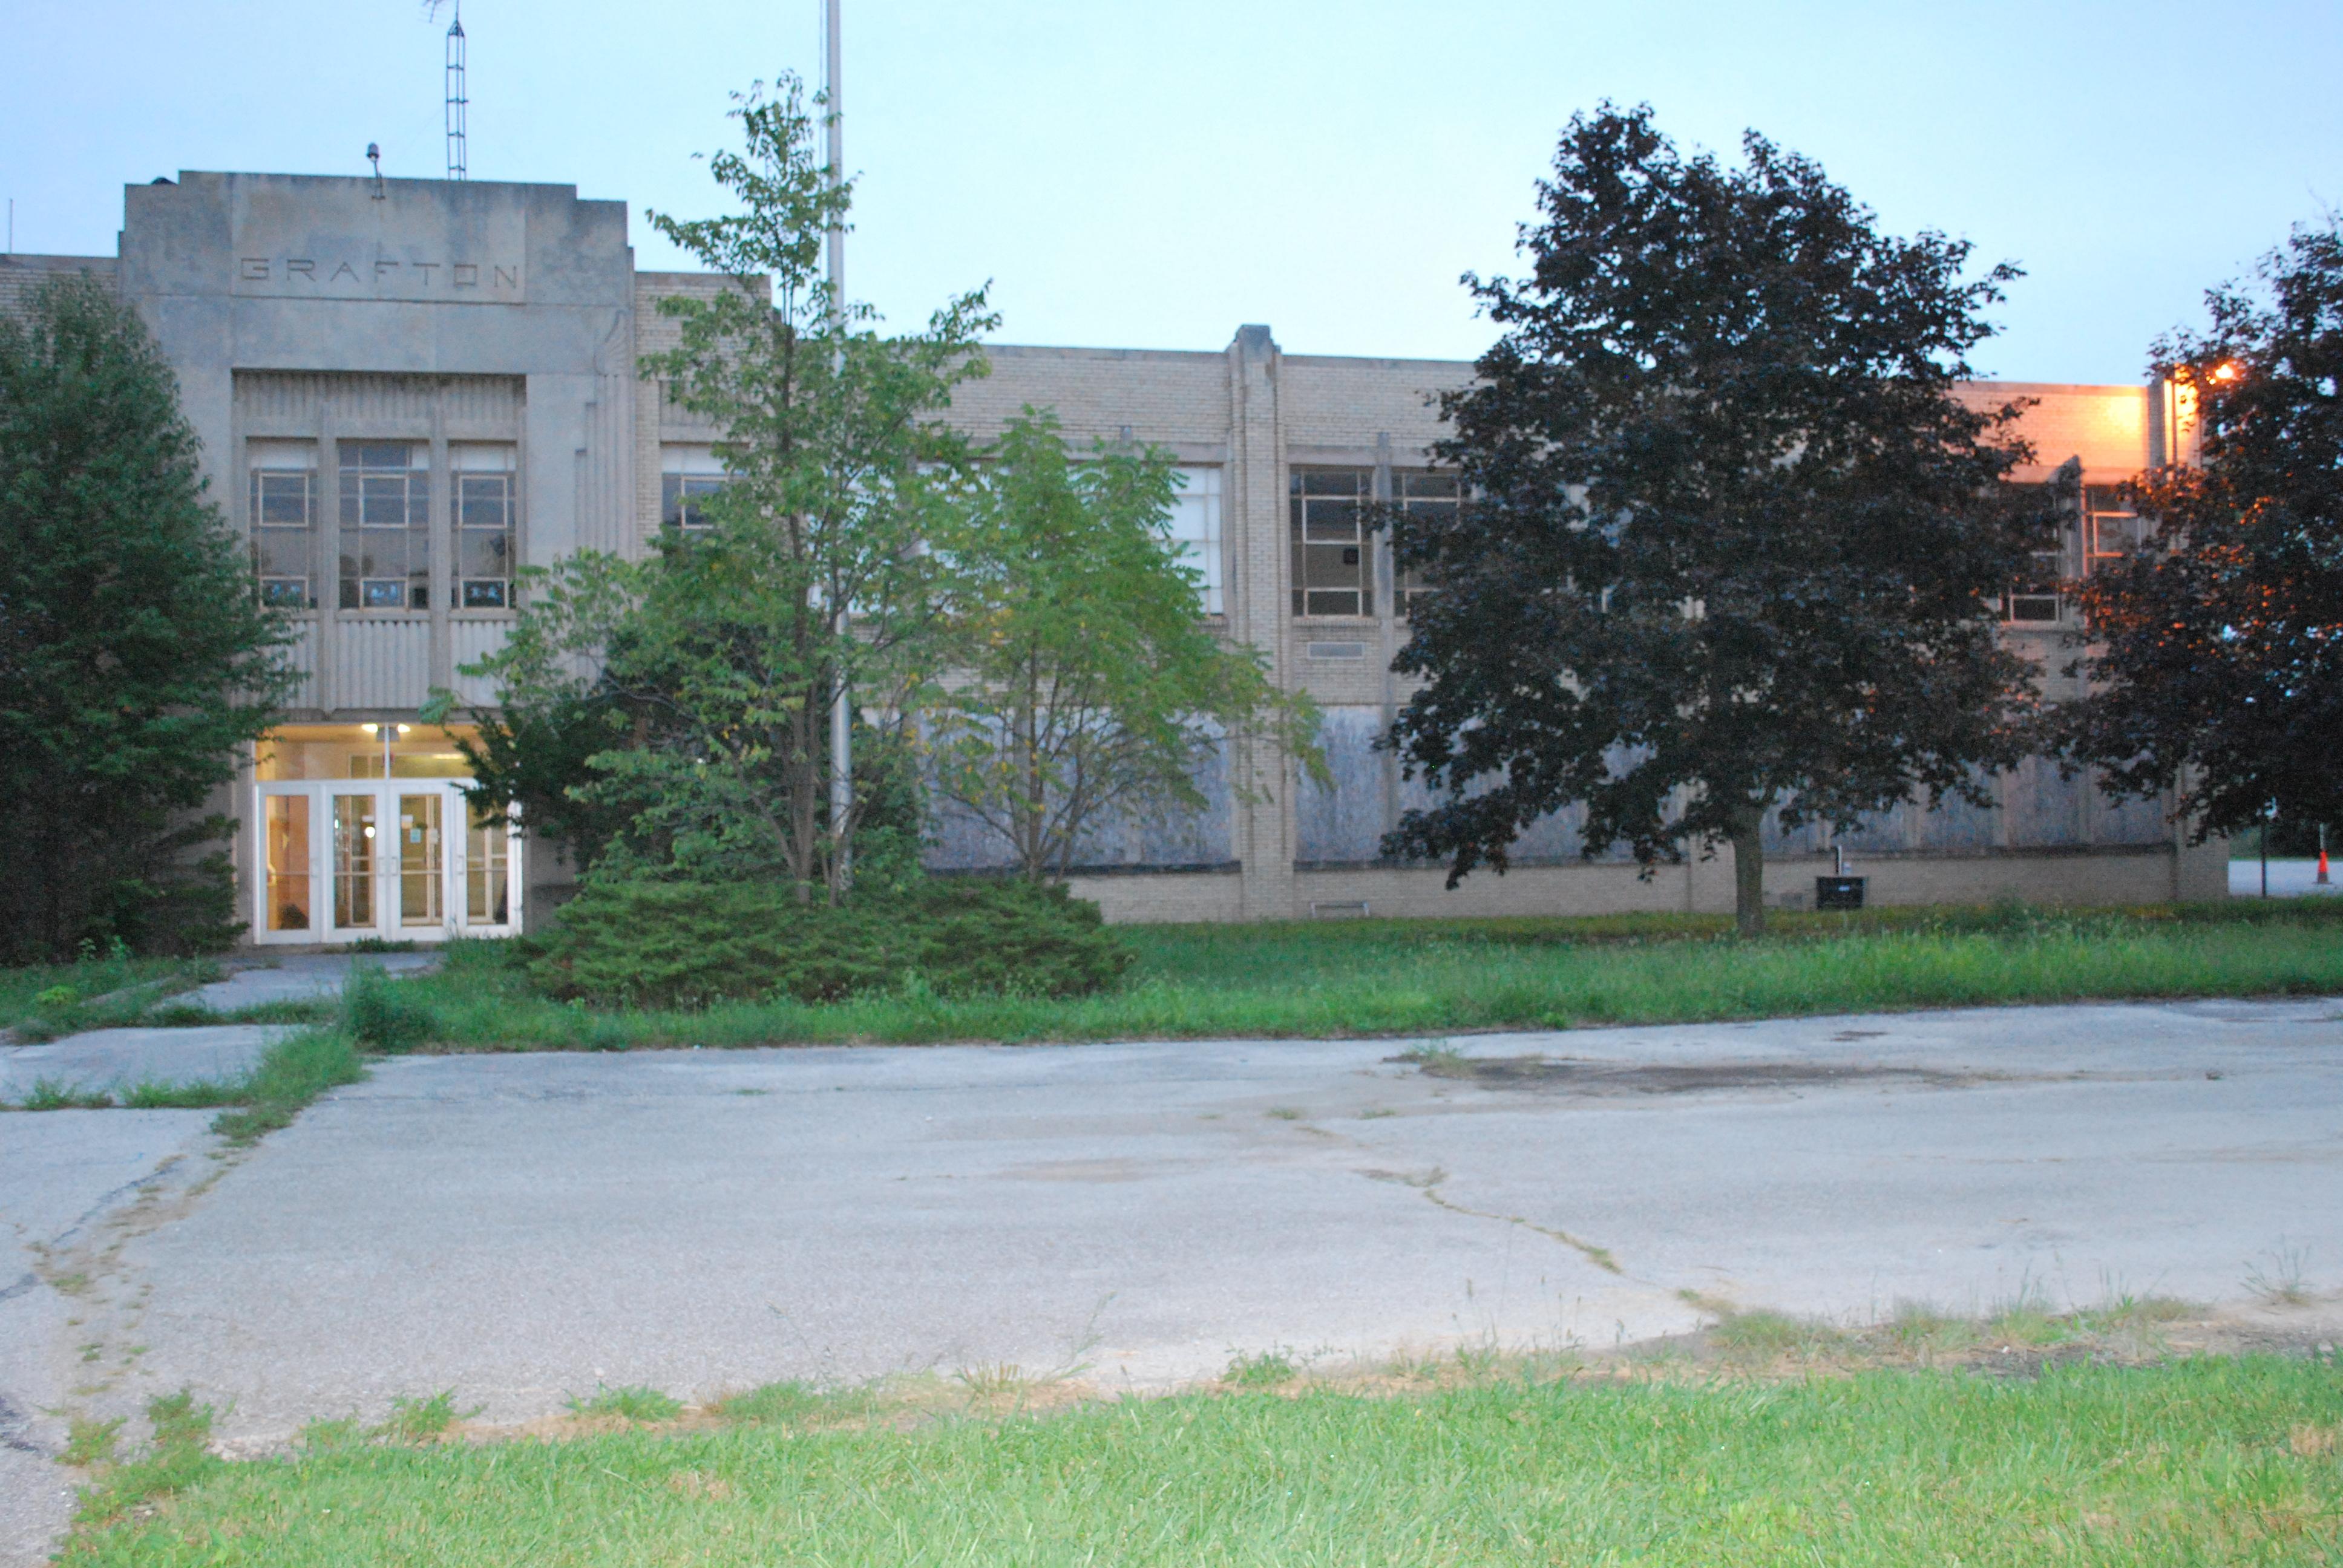 Image Result For Grafton Ohio Building